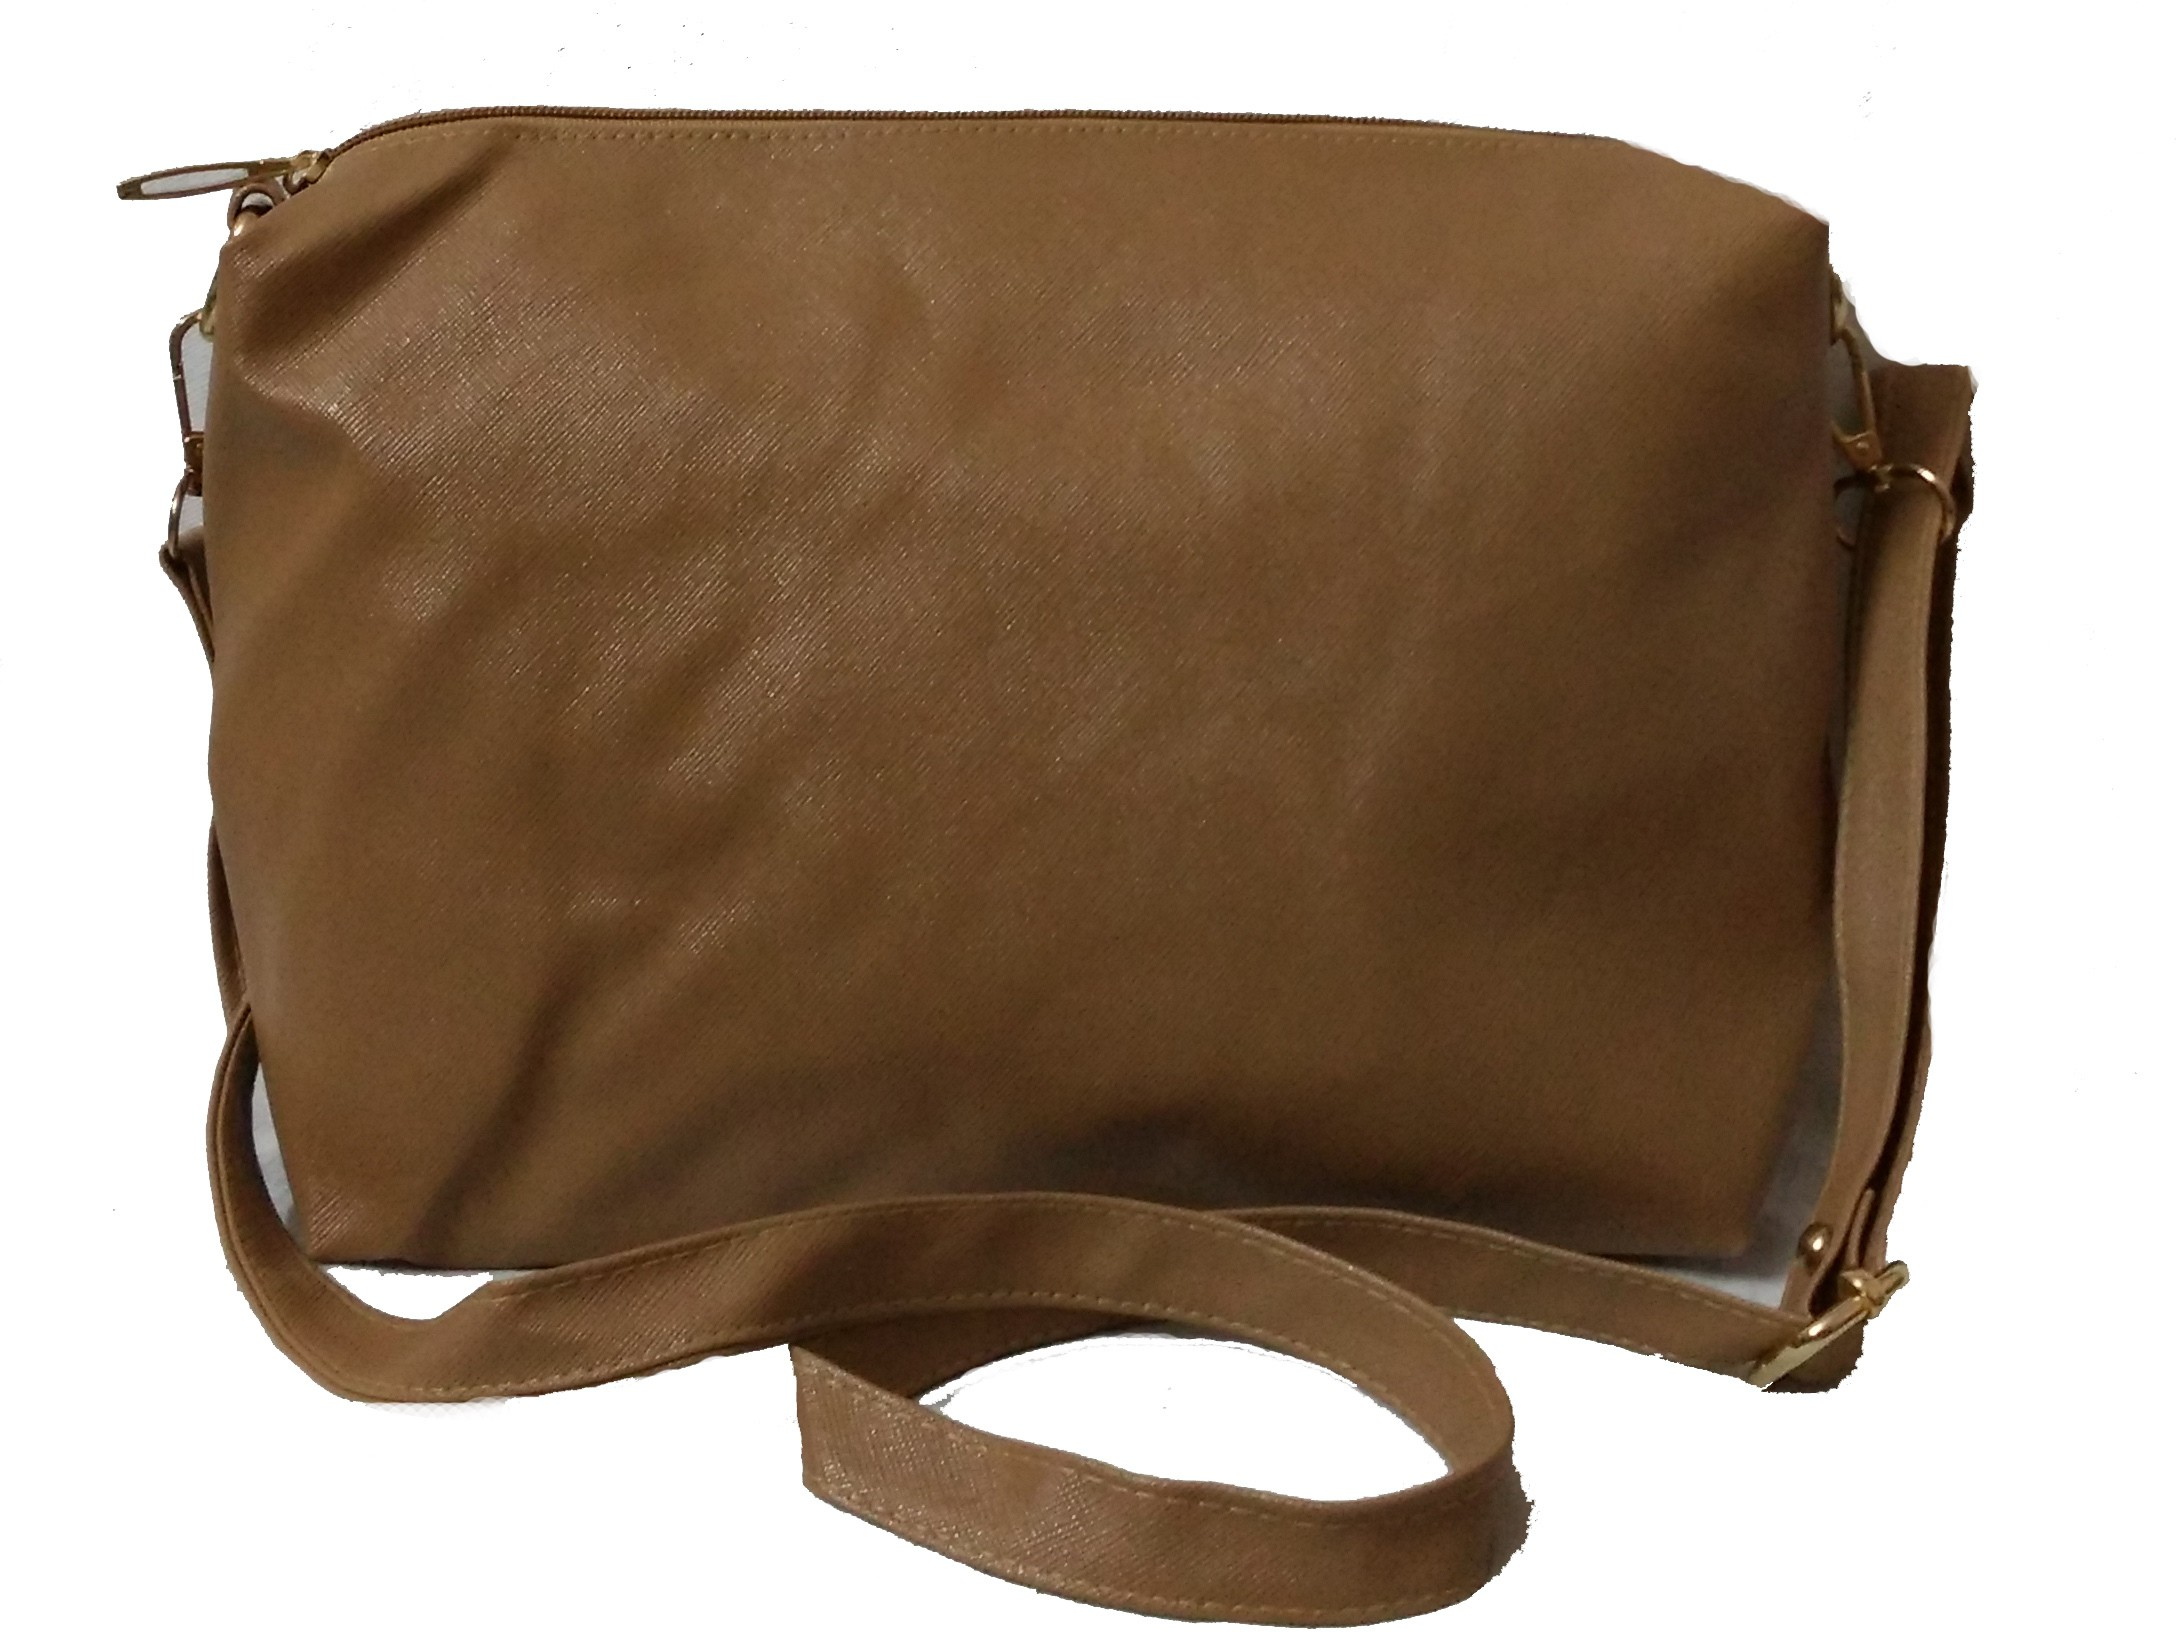 Sling bag below 500 - Craveforit Girls Khaki Pu Sling Bag